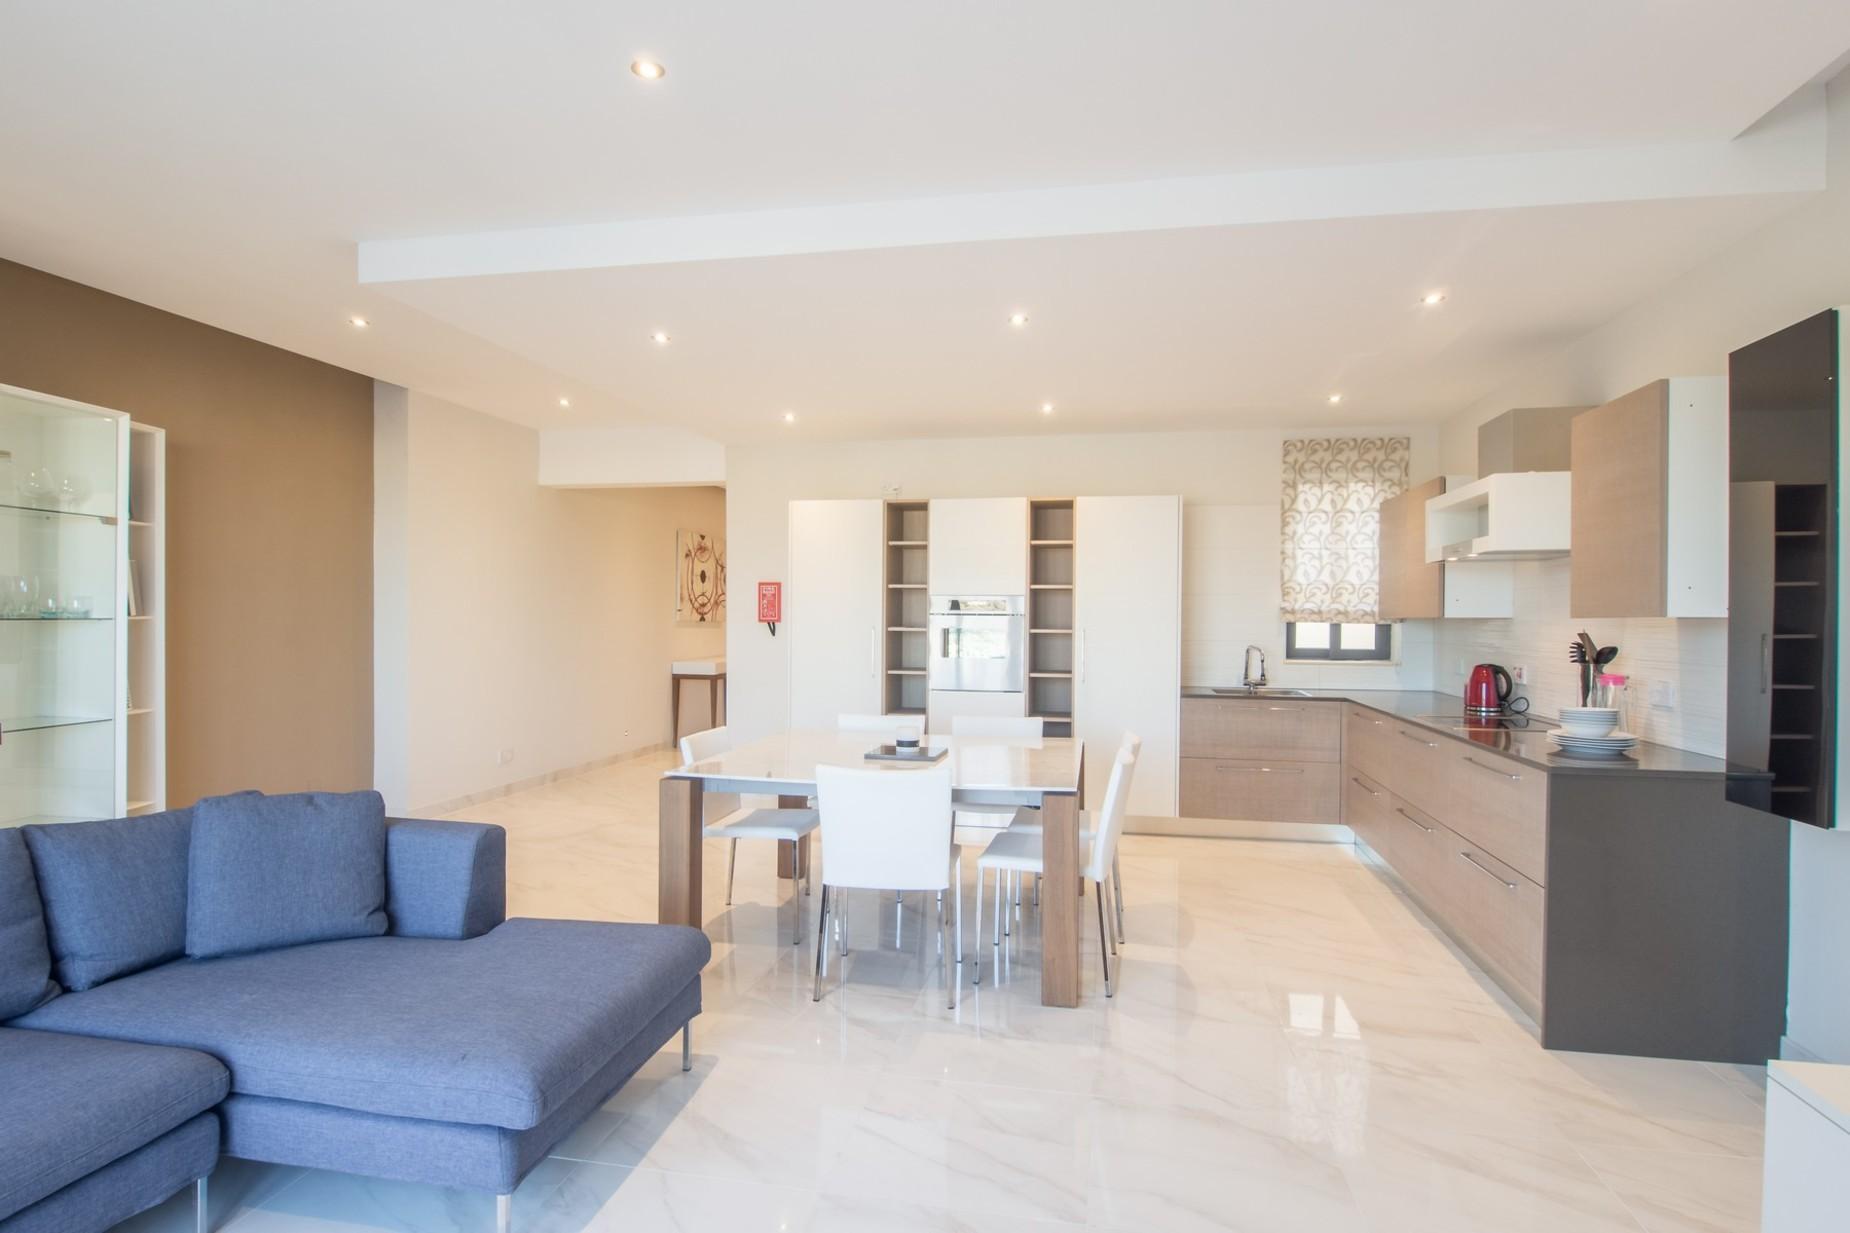 2 bed Apartment For Rent in Xemxija, Xemxija - thumb 2